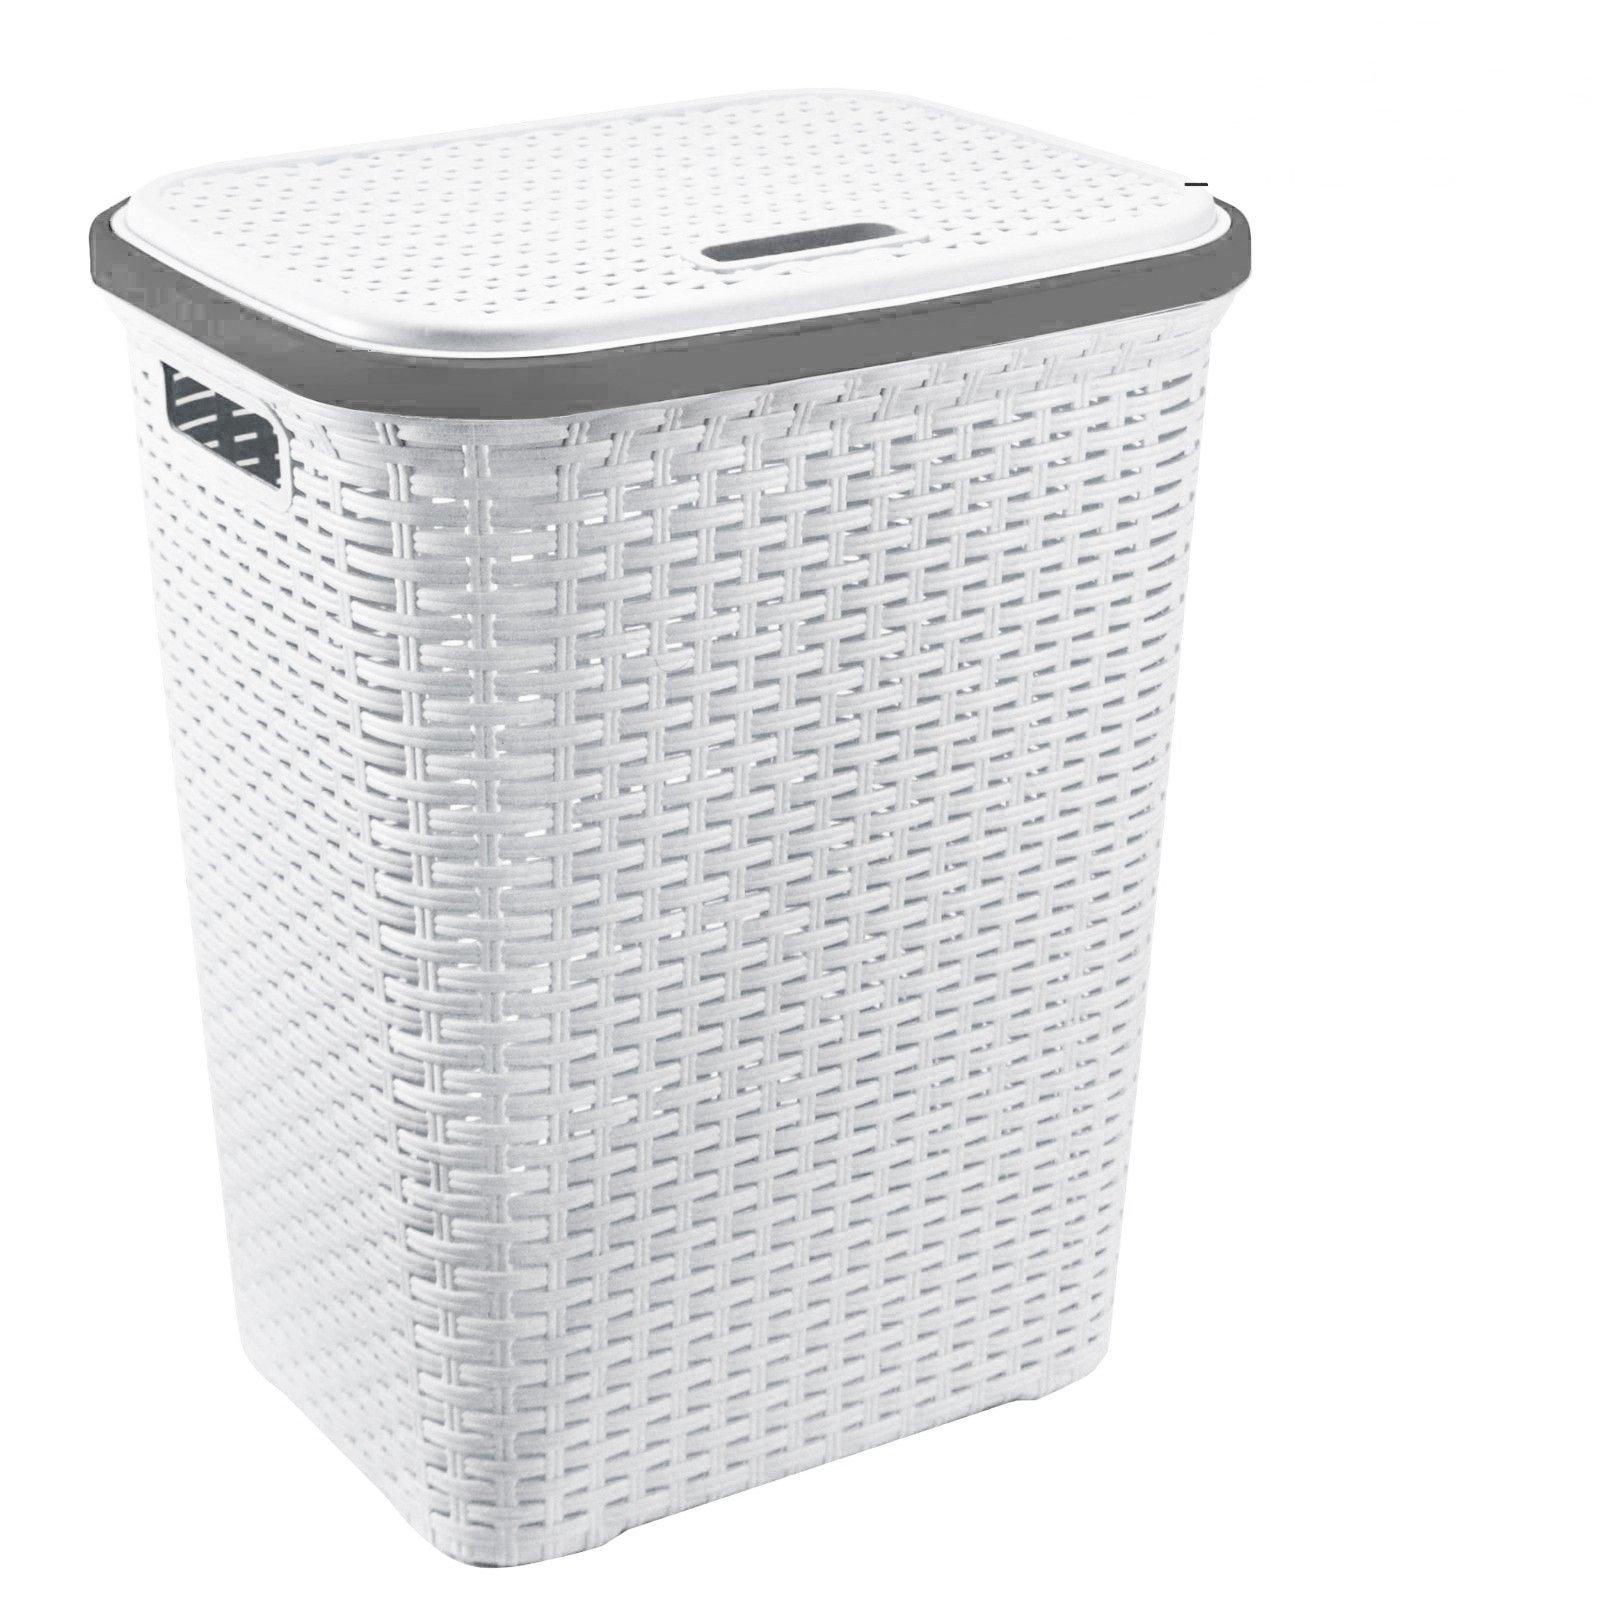 A406 Large Plastic Rattan Laundry Basket Clothes Hamper Linen Storage Lidded Bin Box Laundry Supplies Holder Tidy Silver